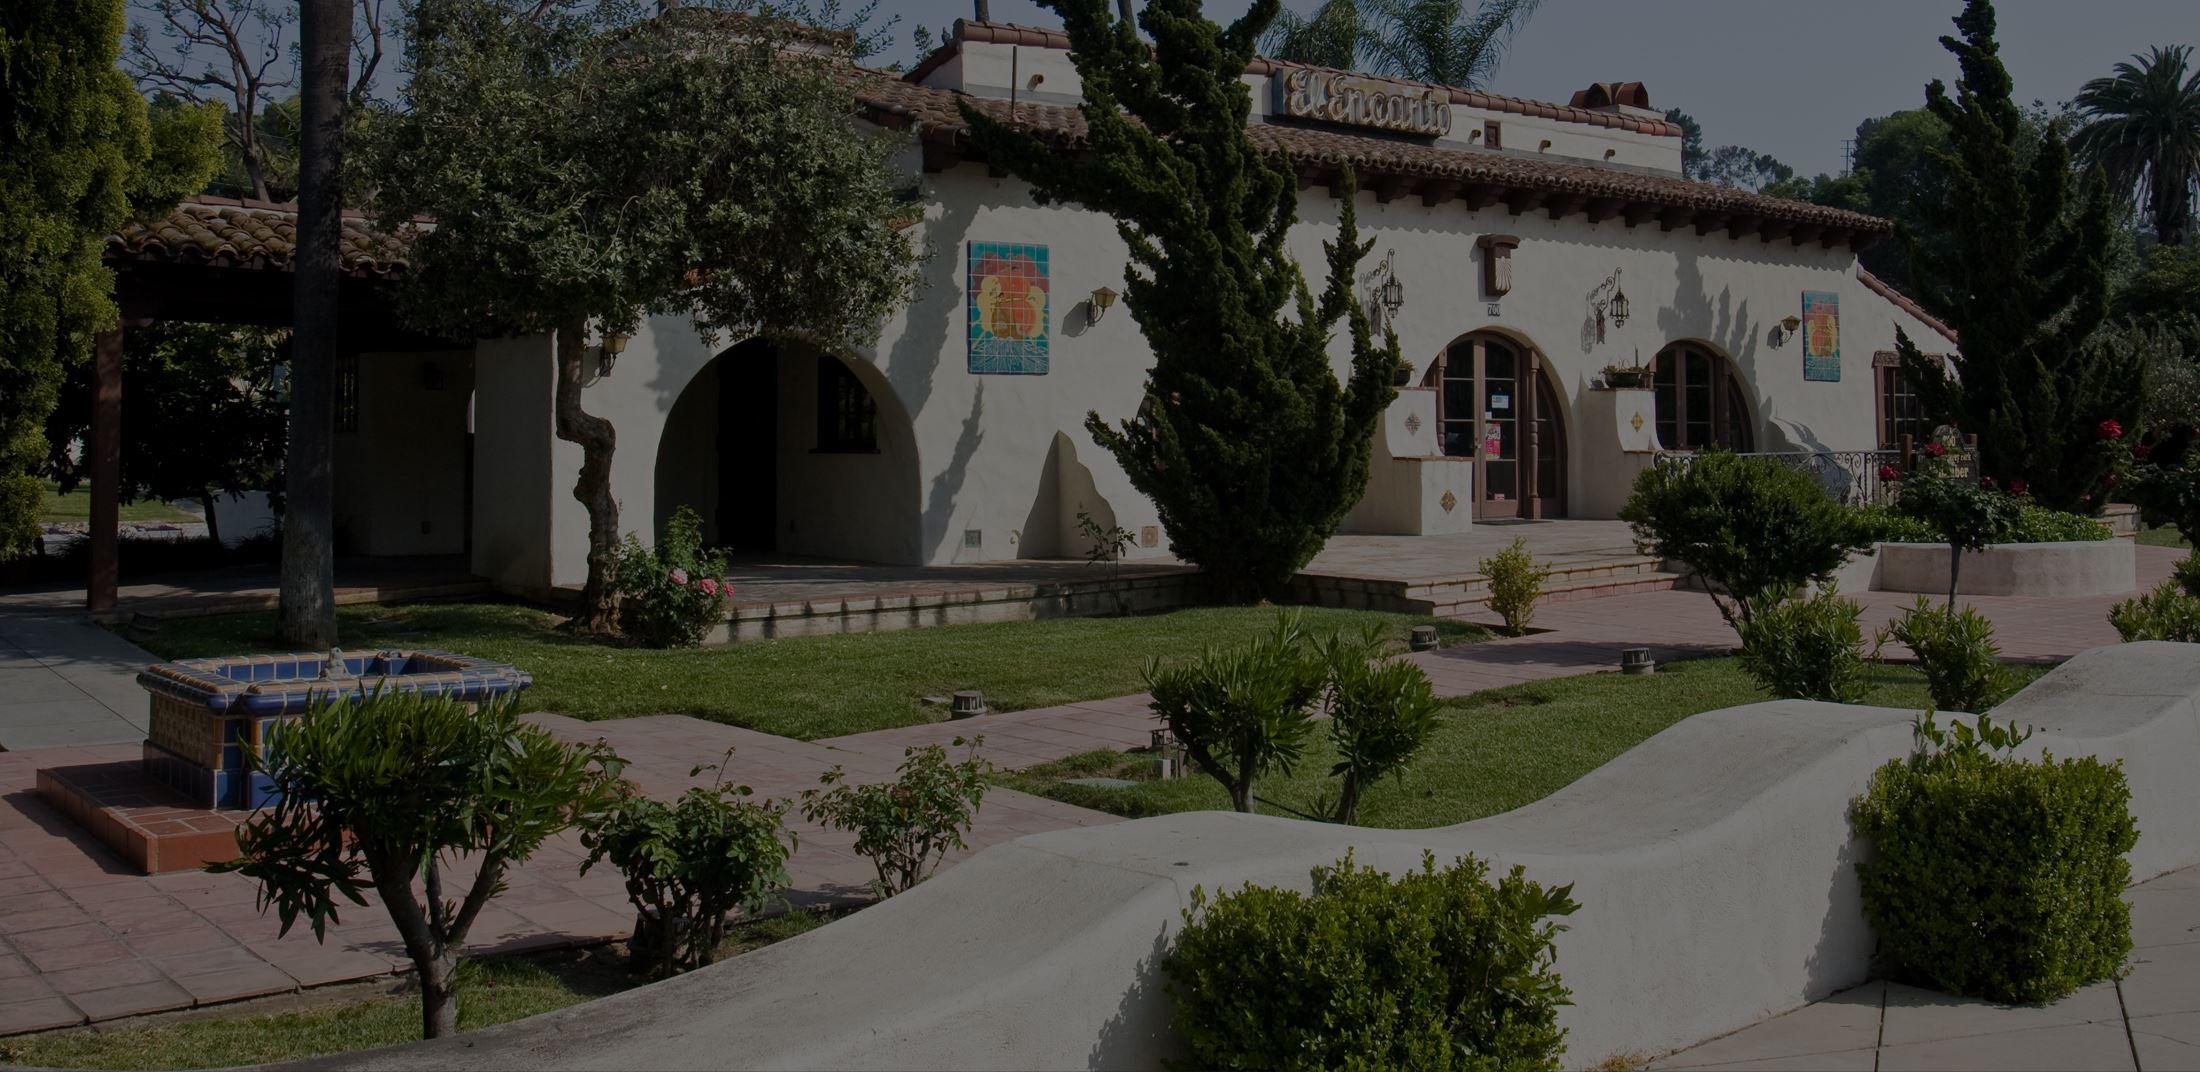 Monterey Park, CA - Official Website | Official Website